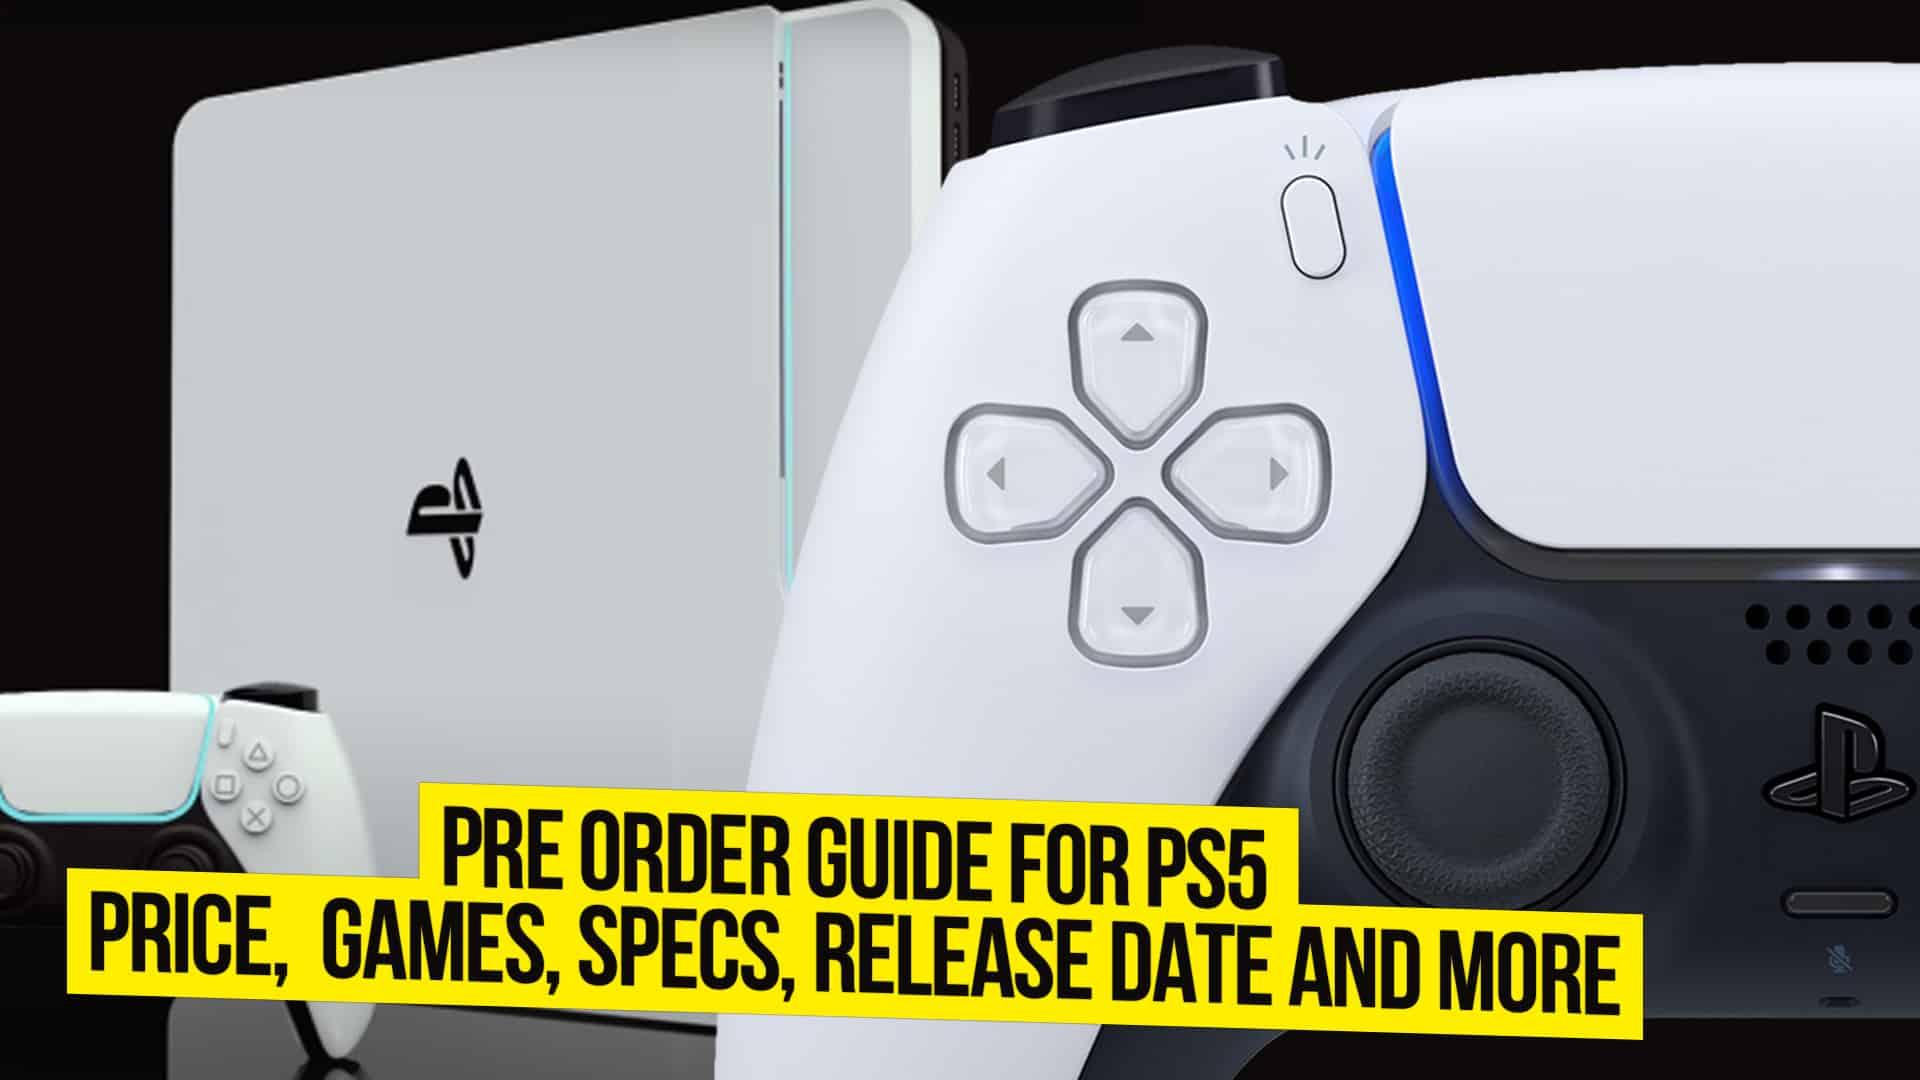 PS5 Pre-Order Guide